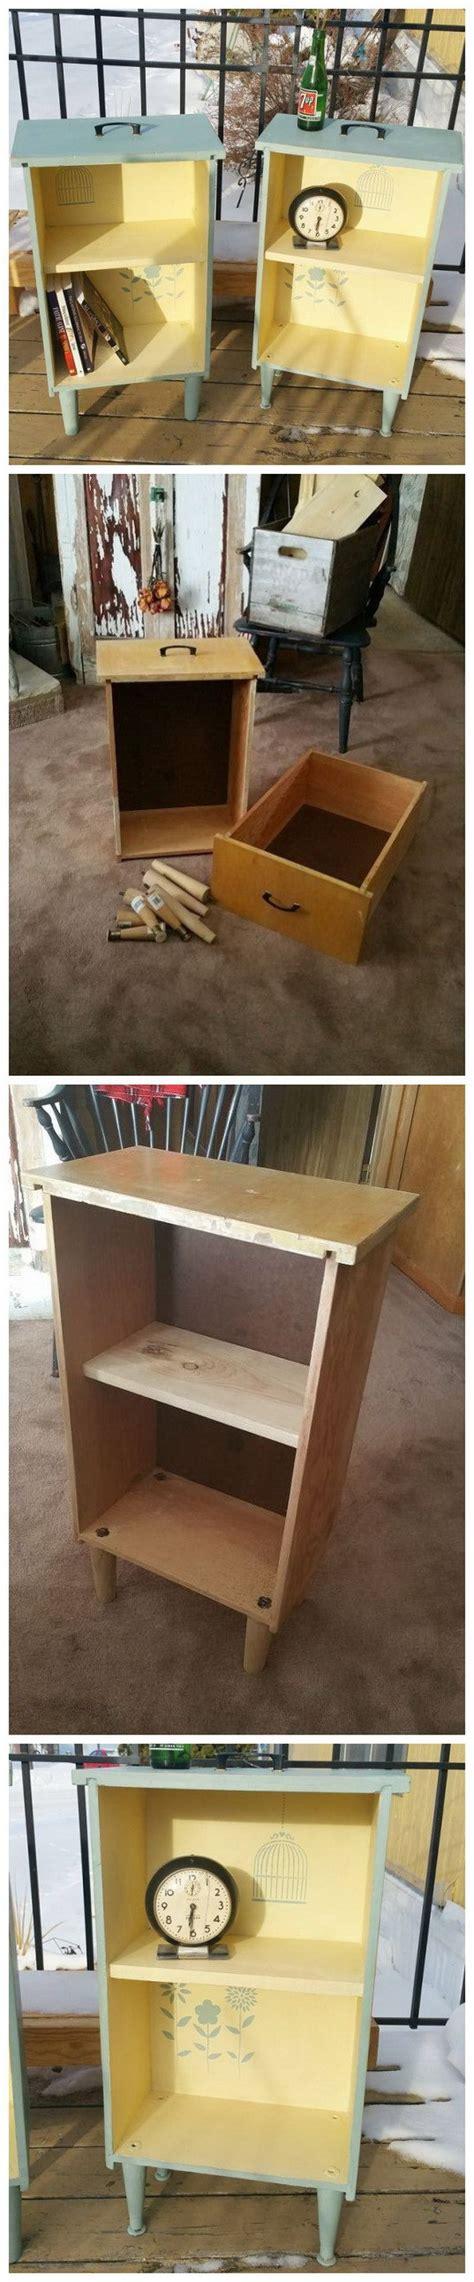 20 DIY Ideas to Reuse Old Furniture   Diy & Crafts Ideas ...